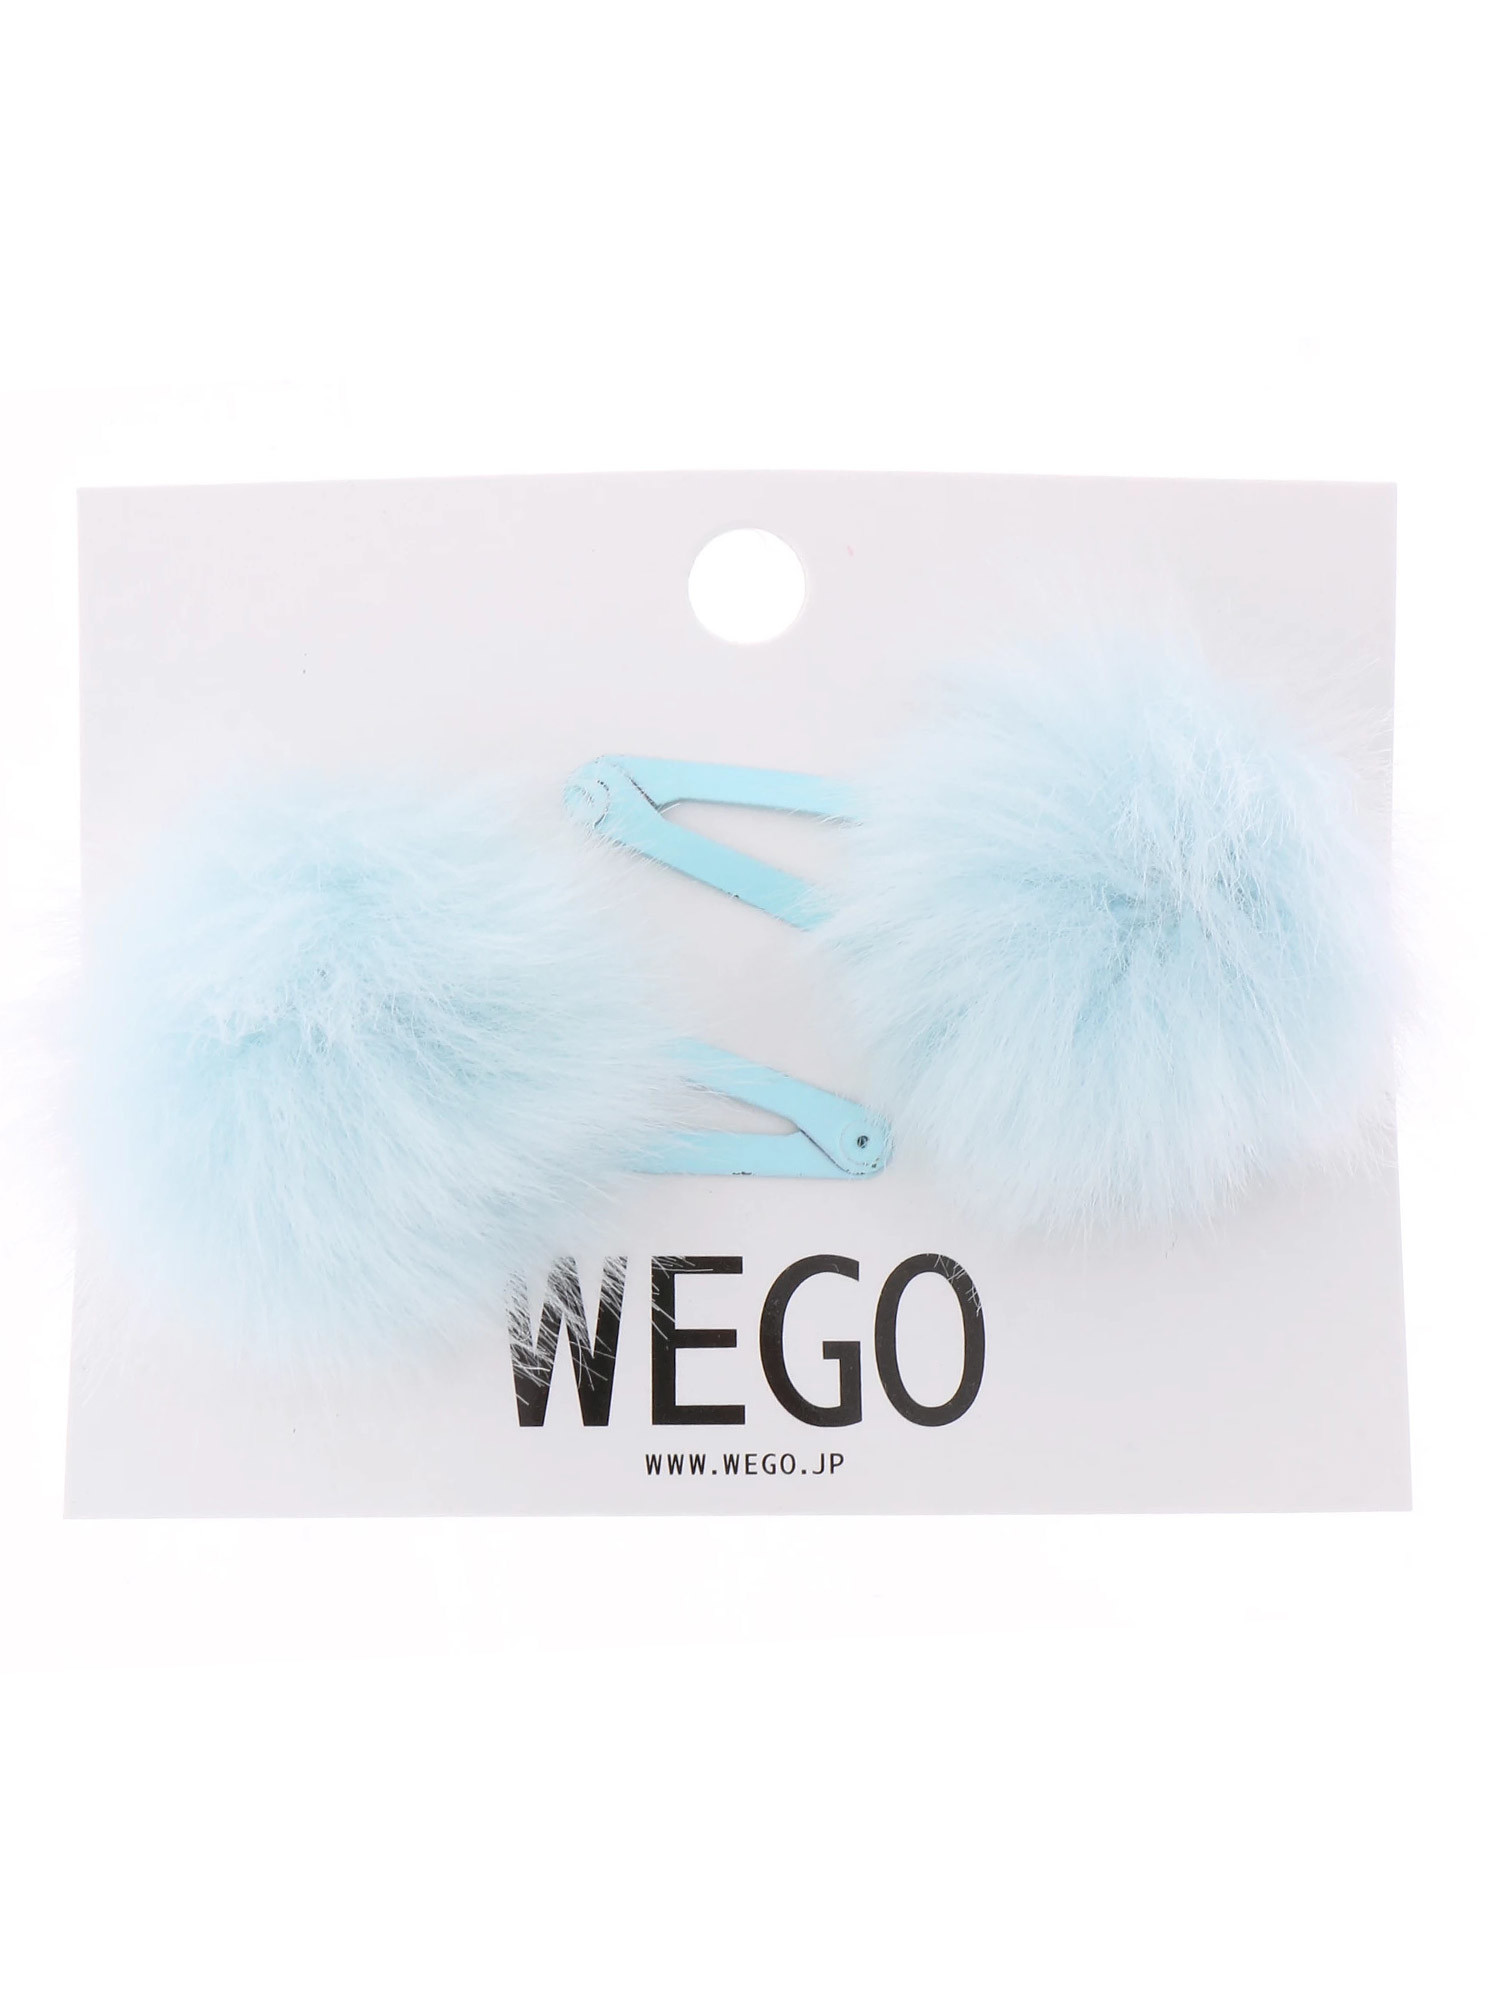 WEGO/ポンポンヘアピン